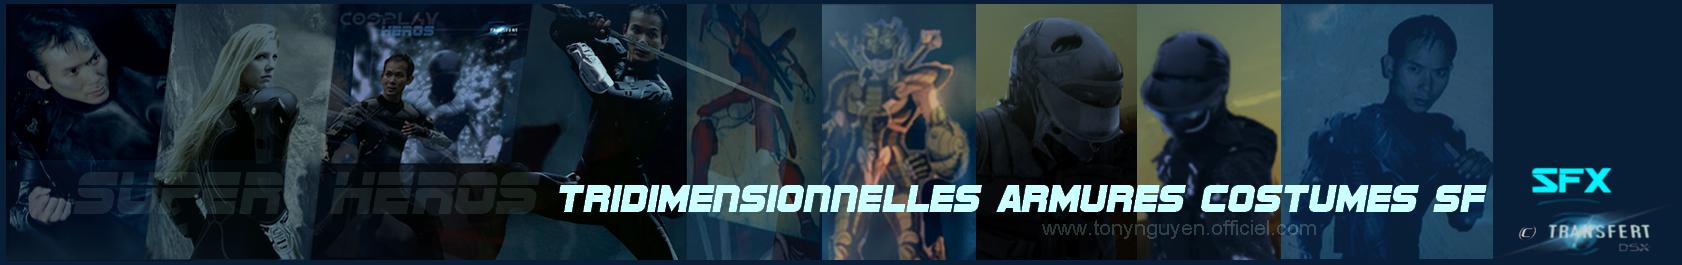 Banniere tridimensionnellesarmurescostumessf cosplayheros tonynguyen transfertdsx